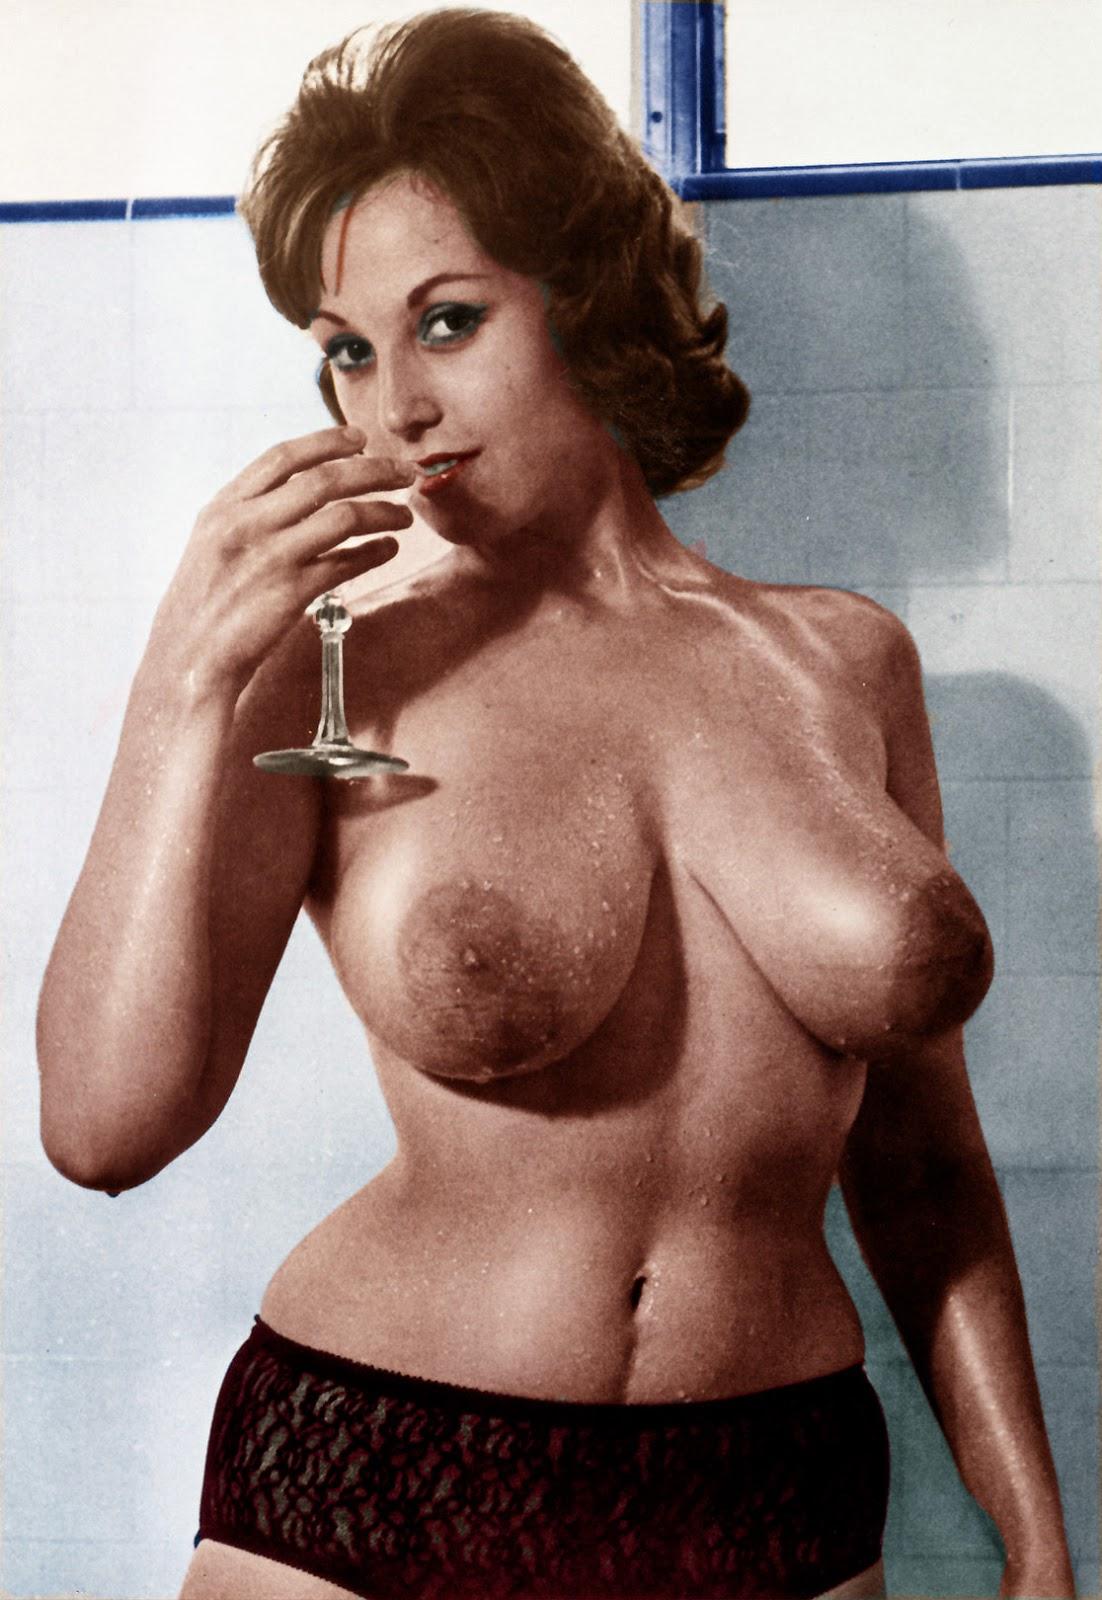 retro-boobs-pictures